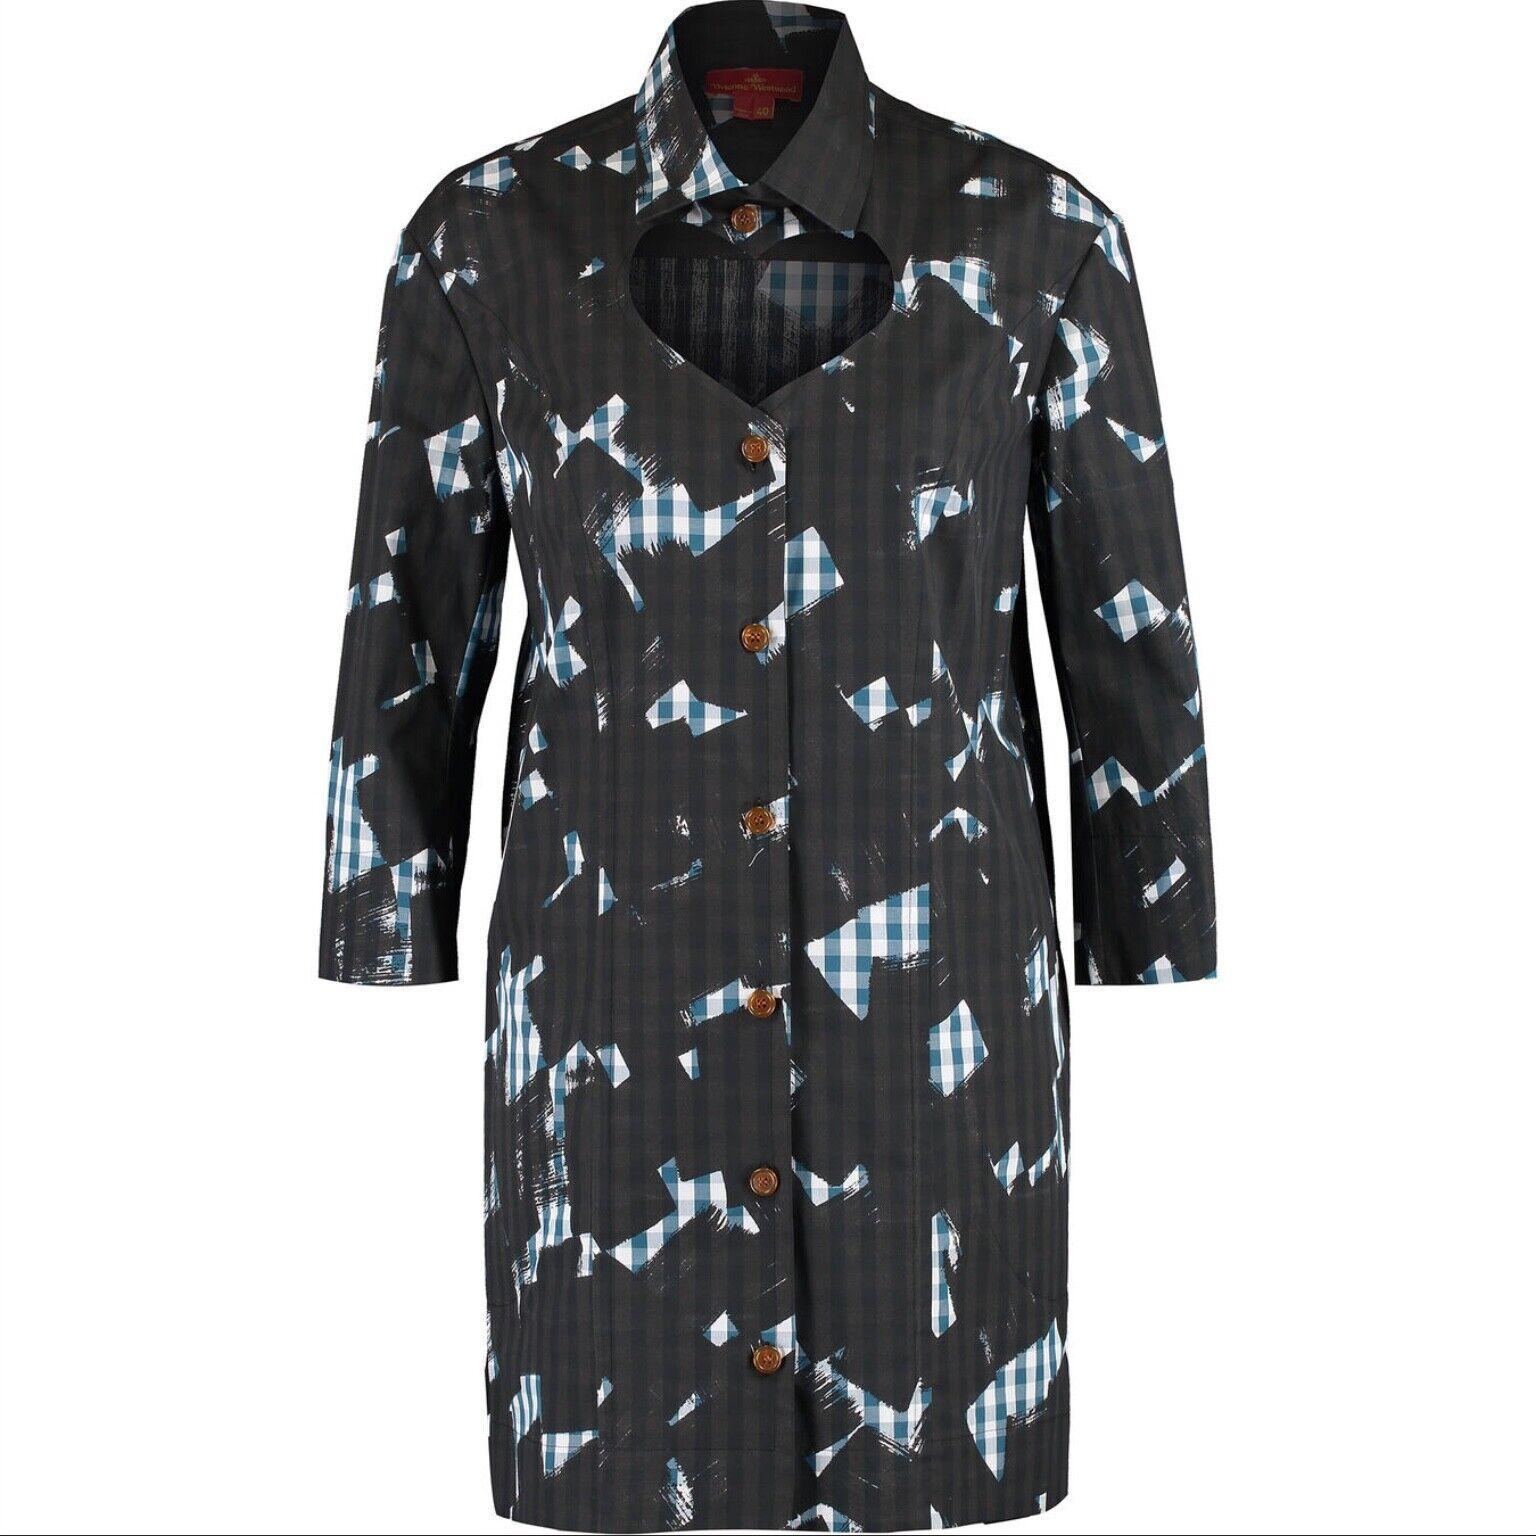 Vivienne Westwood Grey Multi Patterned Oversize  Shirt Dress size IT 44,